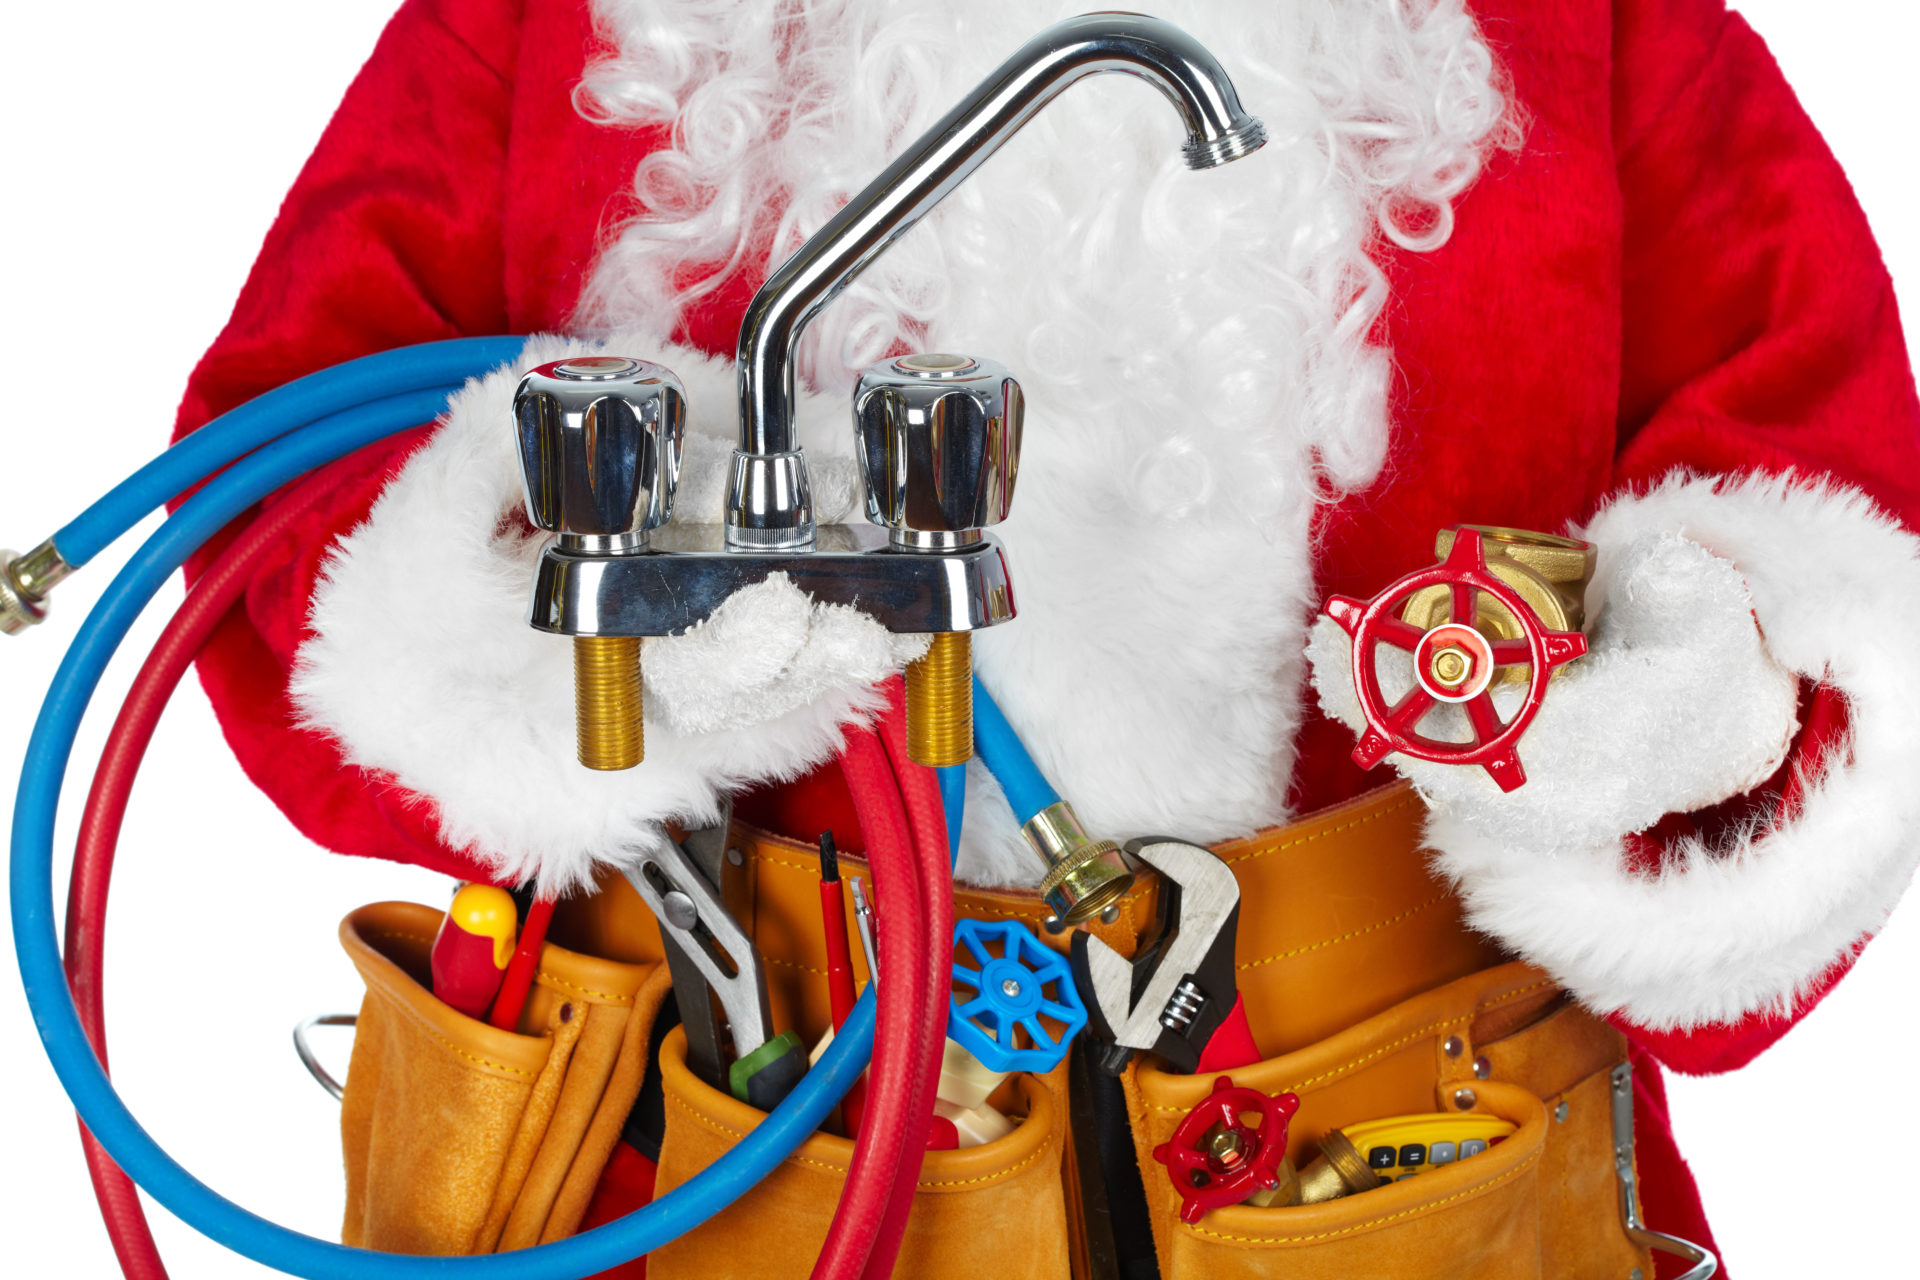 Avoid inviting the plumber over for Christmas!